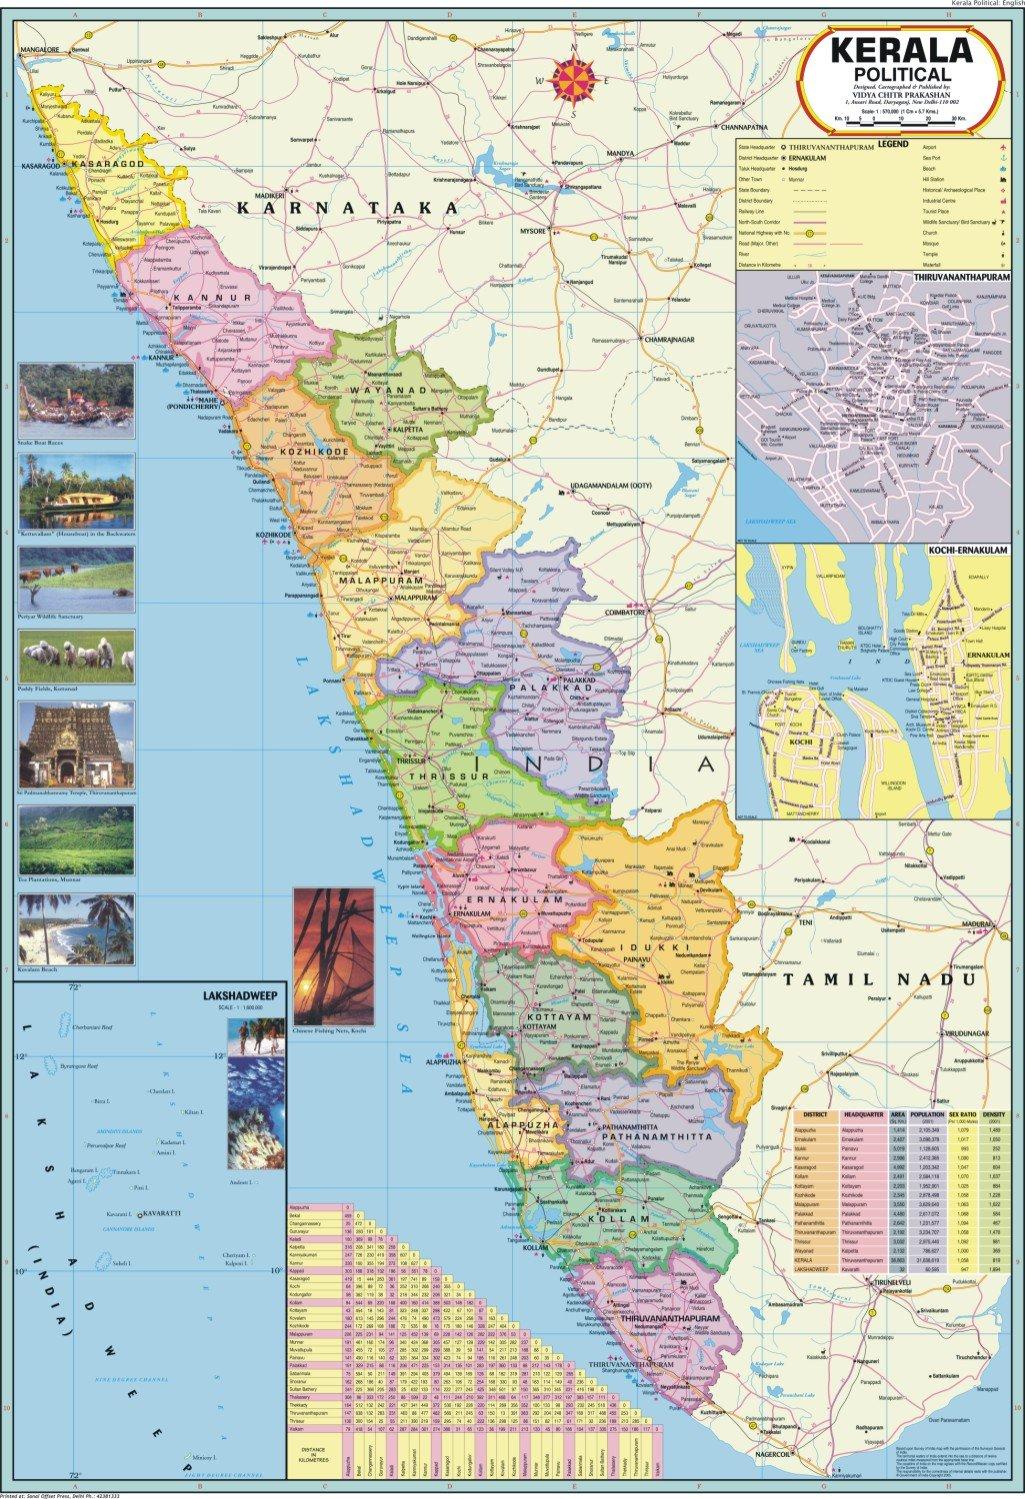 Buy Kerala Map Book Online at Low Prices in India | Kerala